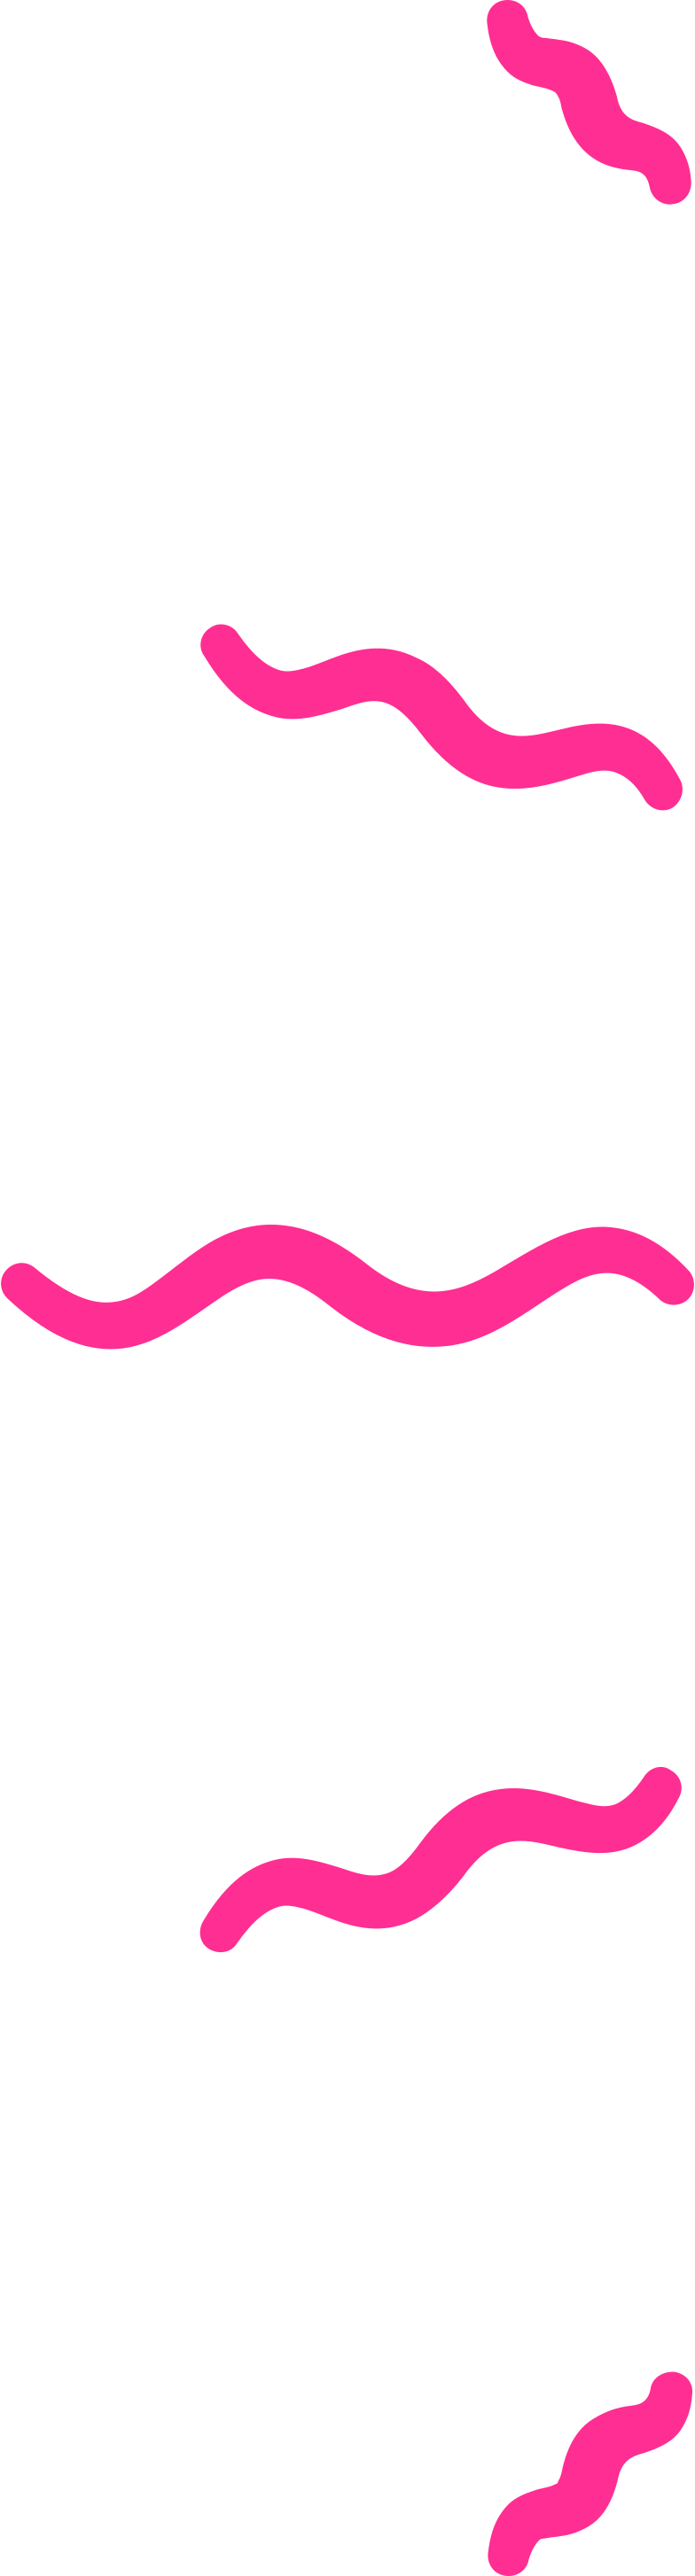 vibration lines Clipart illustration in PNG, SVG